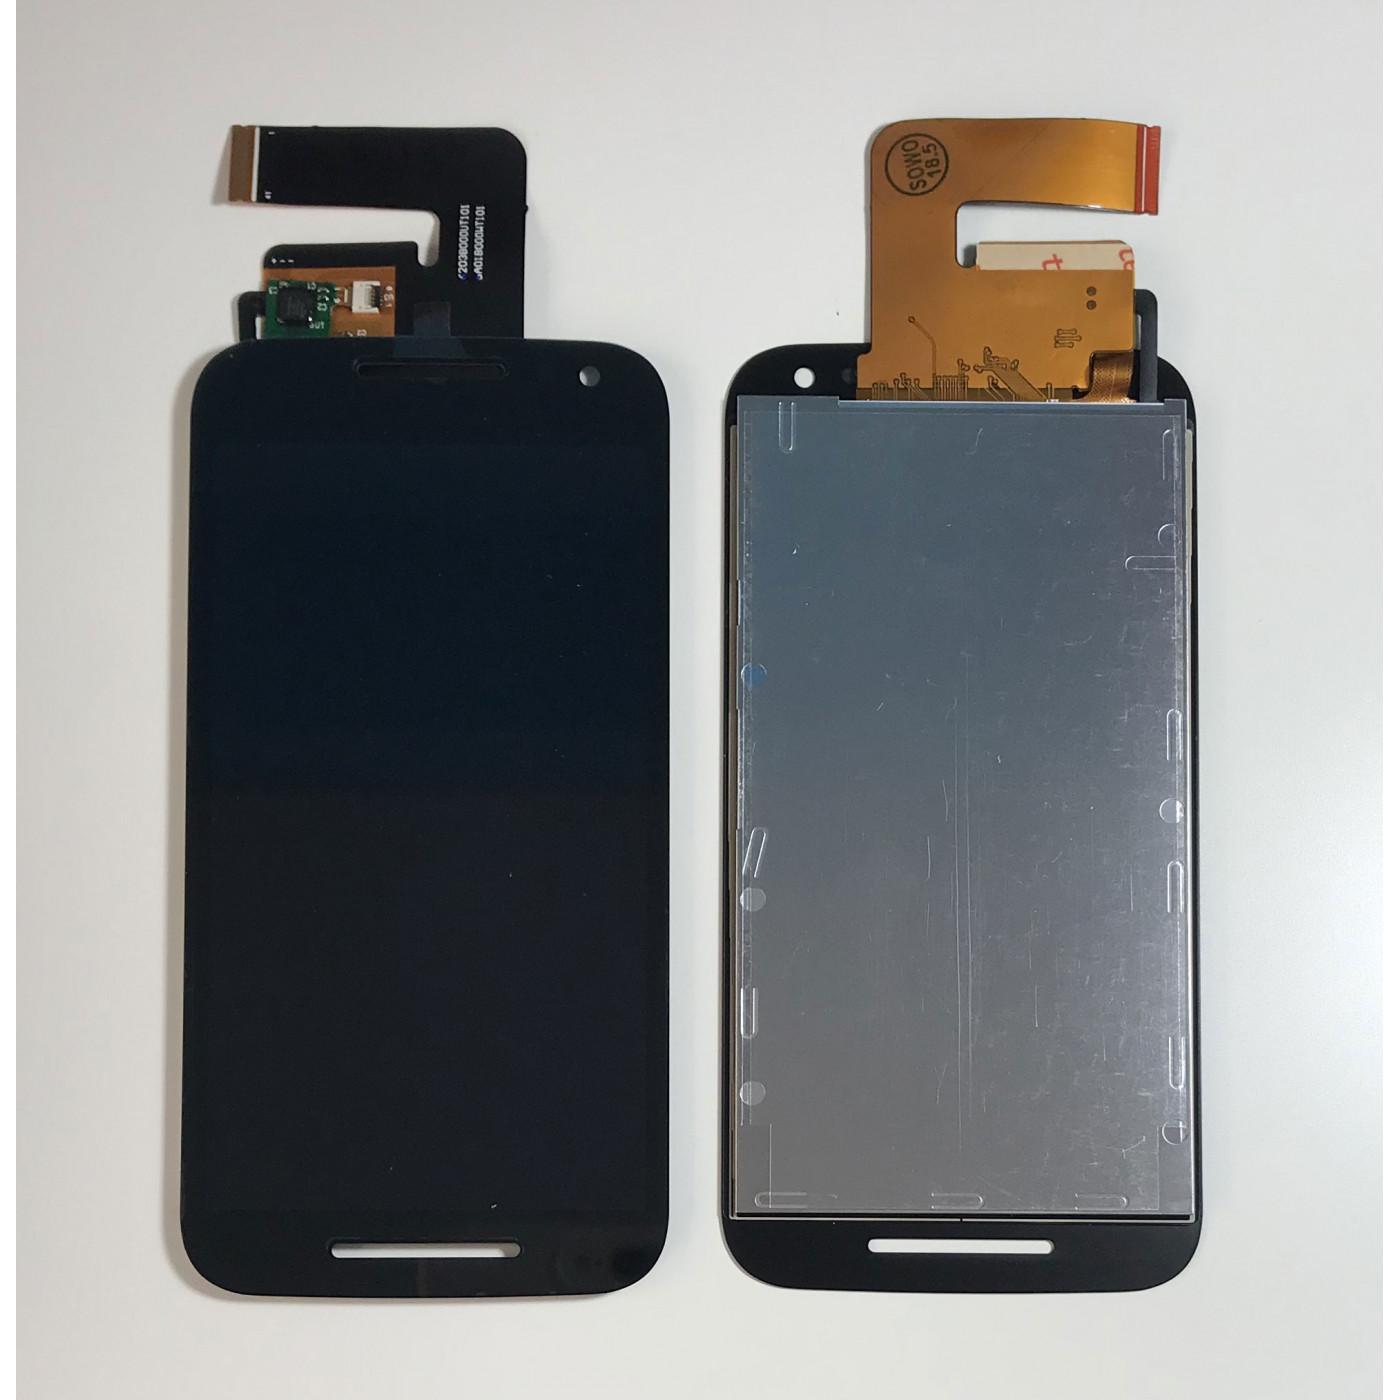 PANTALLA LCD para Motorola Moto G3 XT1541 XT1540 XT1550 VIDRIO PANTALLA TÁCTIL Negro